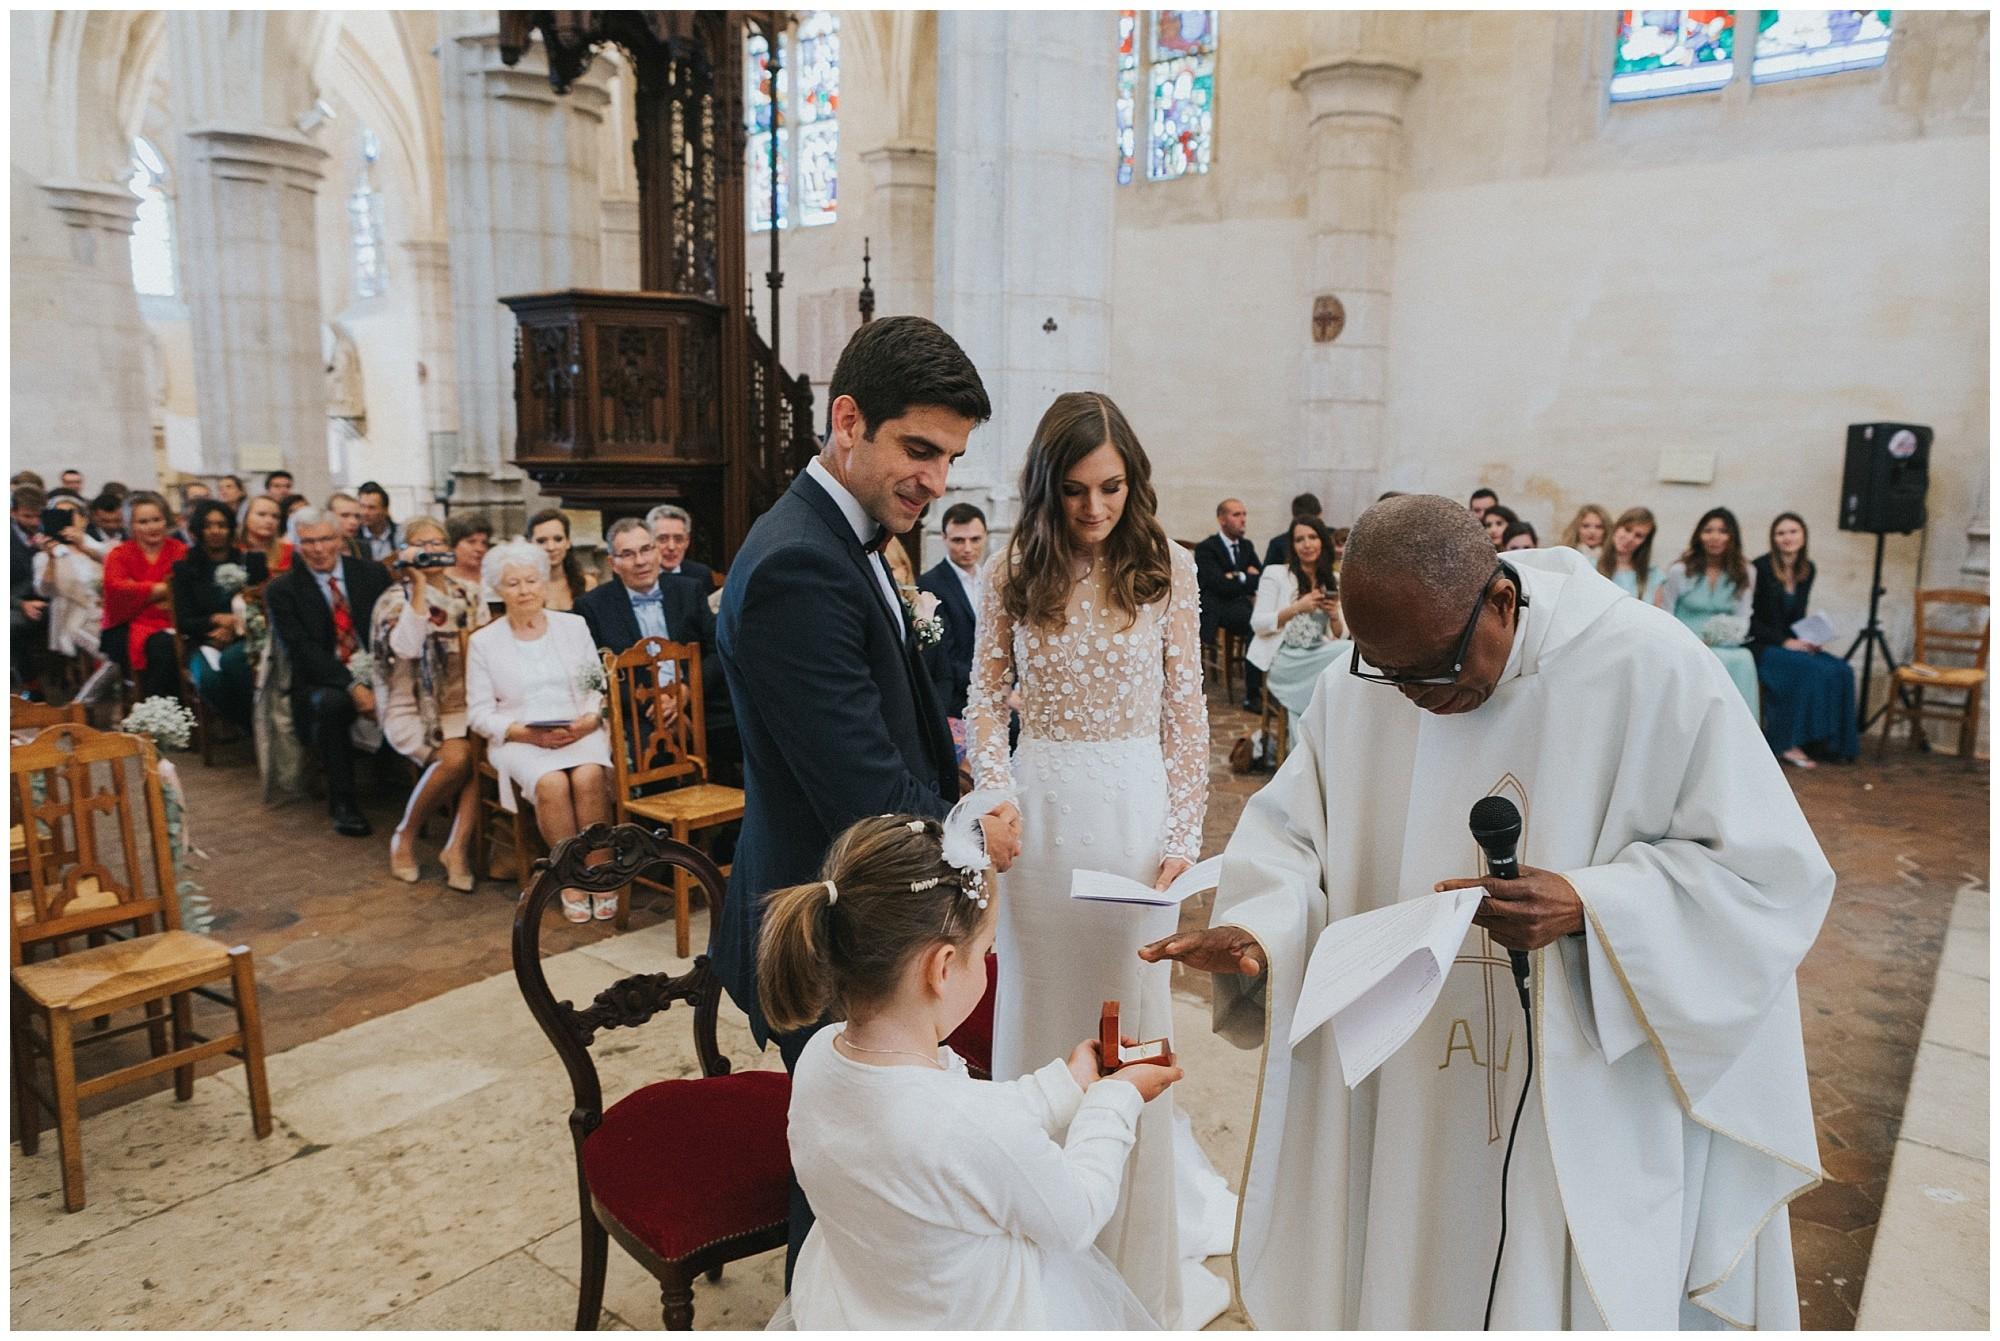 Kateryna-photos-photographer-reims-domaine-des-evis-mariage-normandie--celebration-eglise